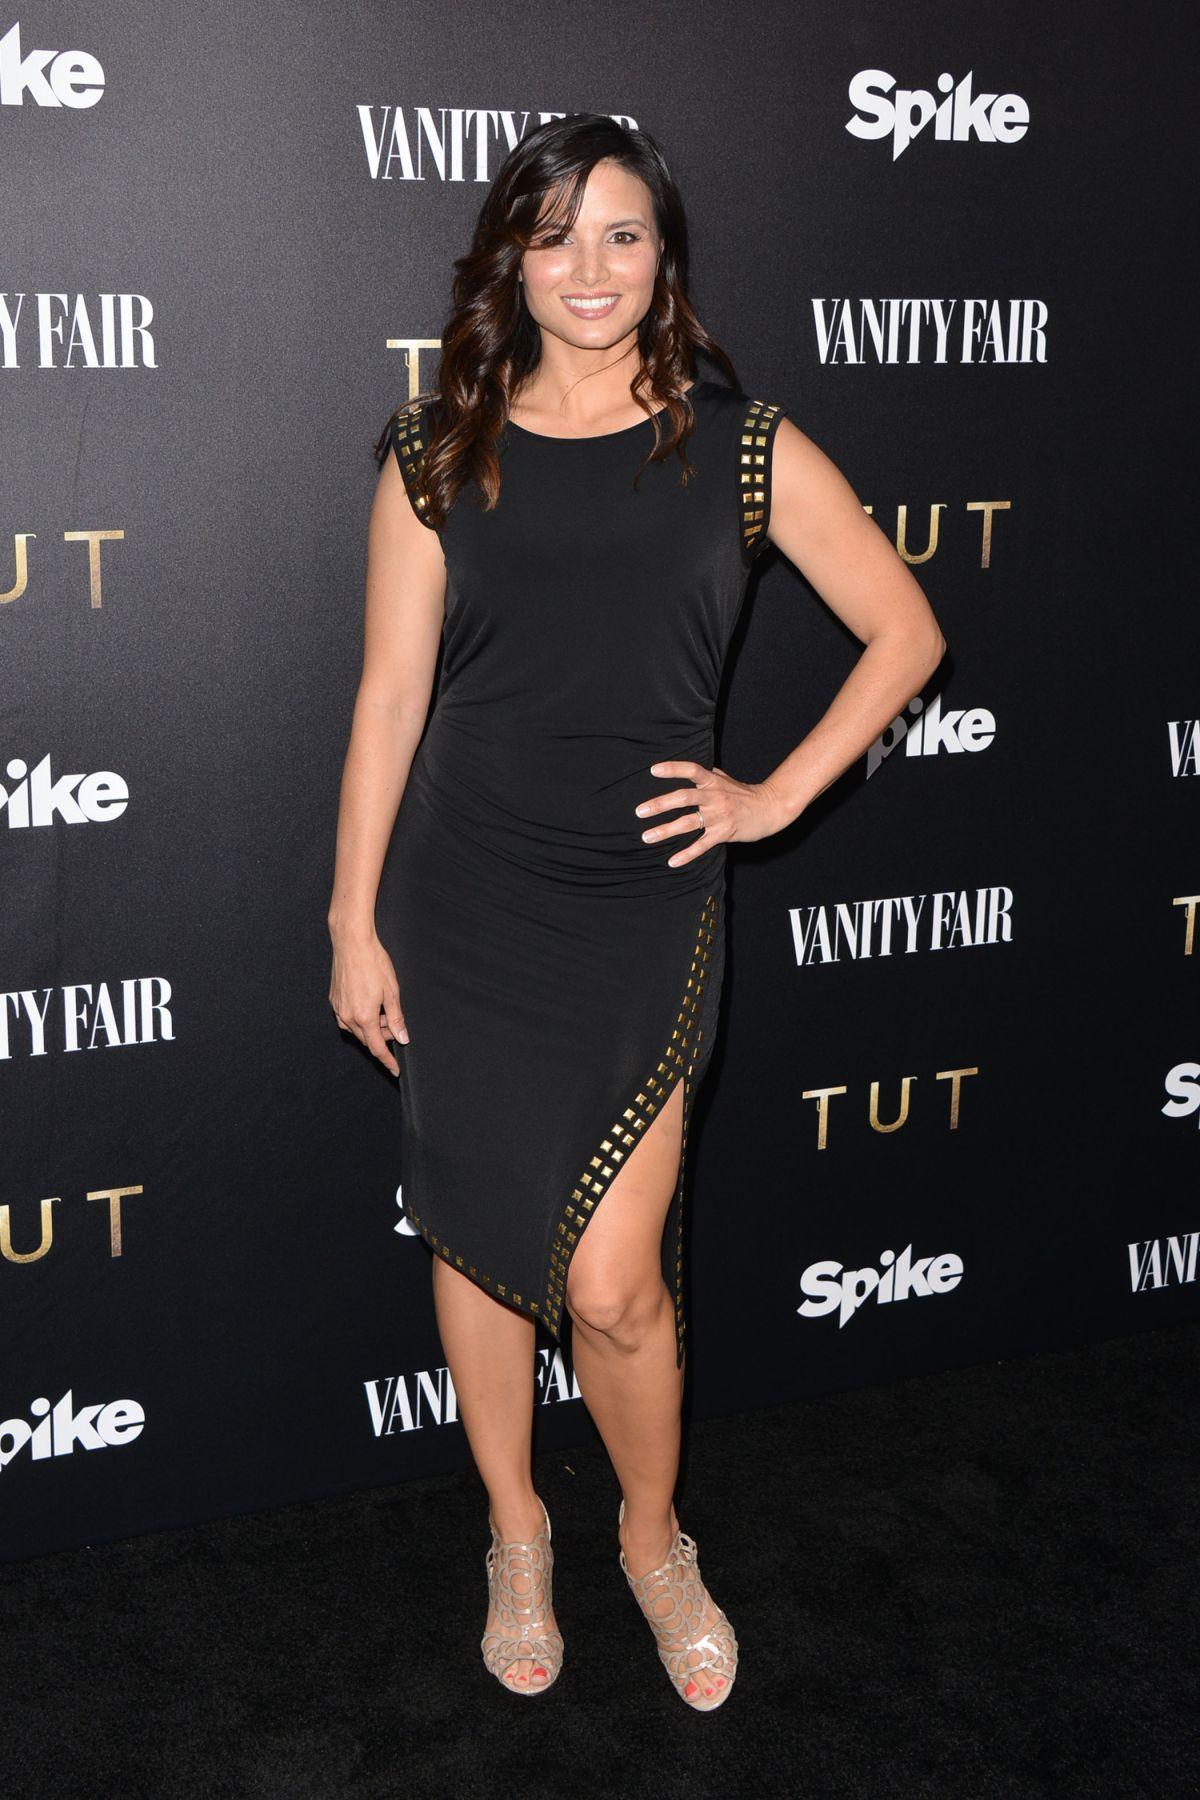 KATRINA LAW at Vanity Fair and Spike TV Celebrate Tut Series Premiere in Los Angeles